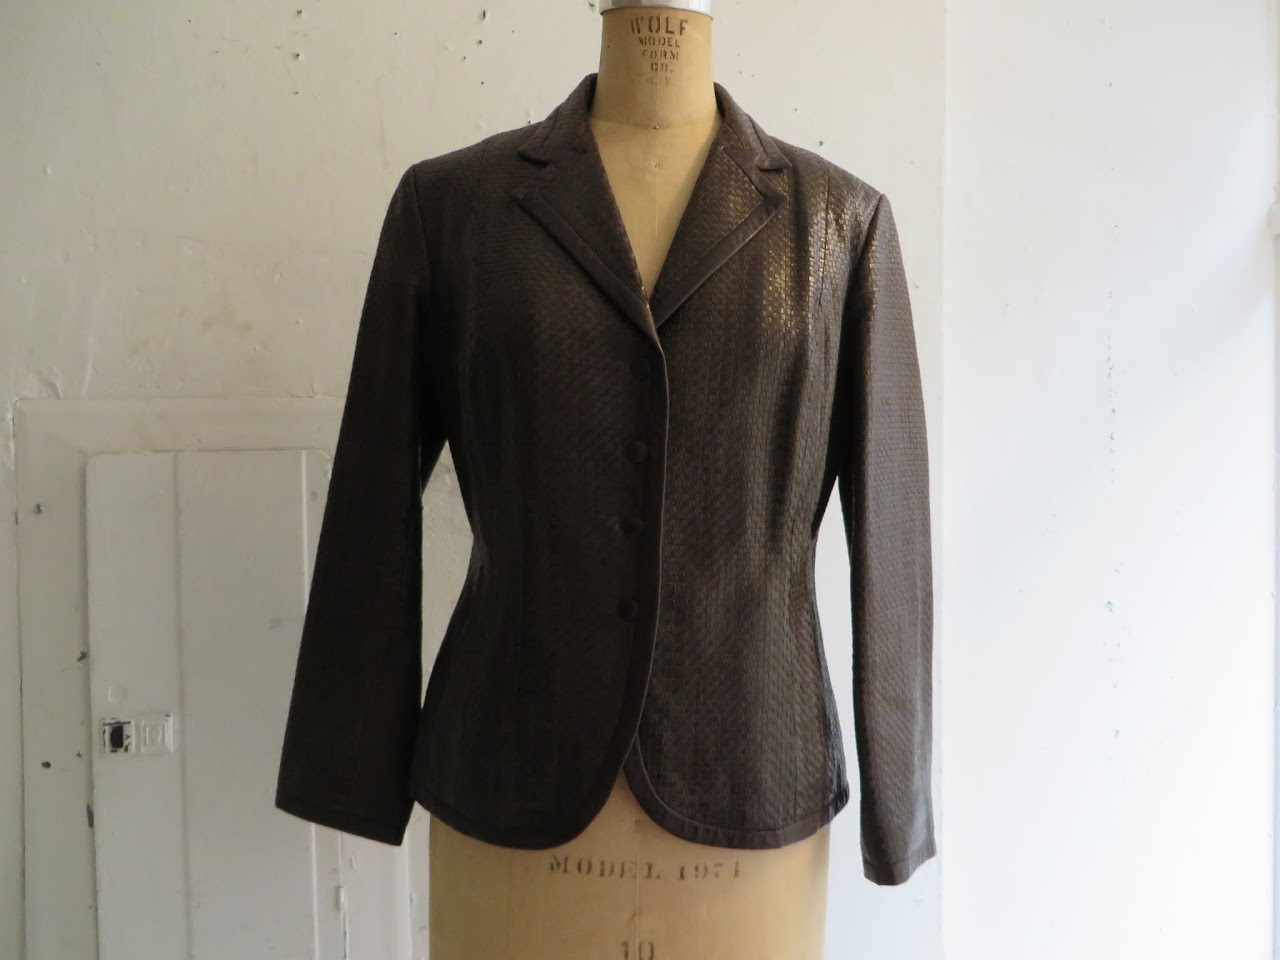 Max Mara Woven Leather Jacket